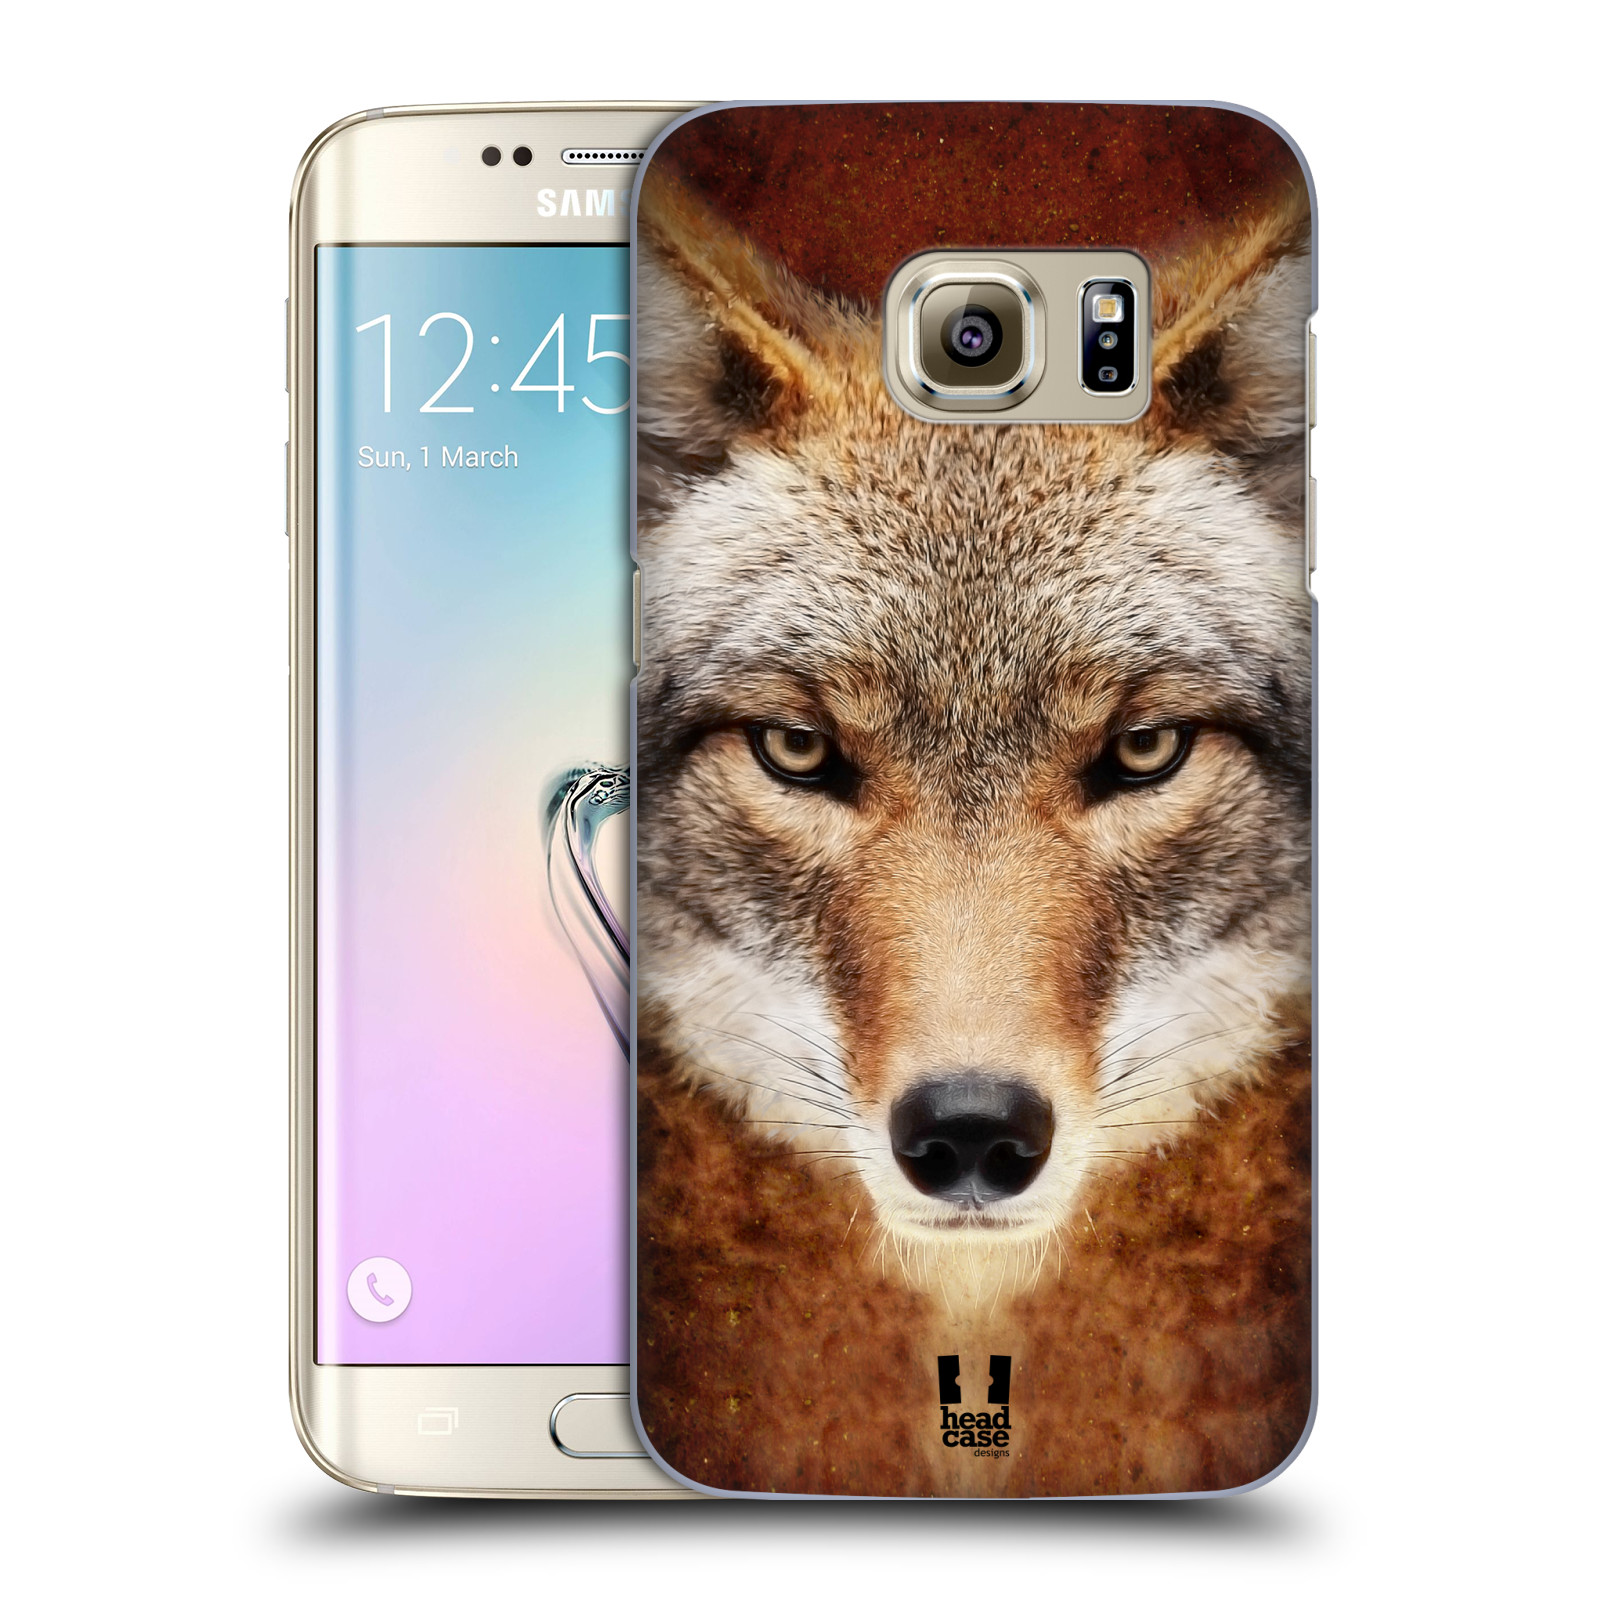 HEAD CASE plastový obal na mobil SAMSUNG GALAXY S7 EDGE vzor Zvířecí tváře kojot